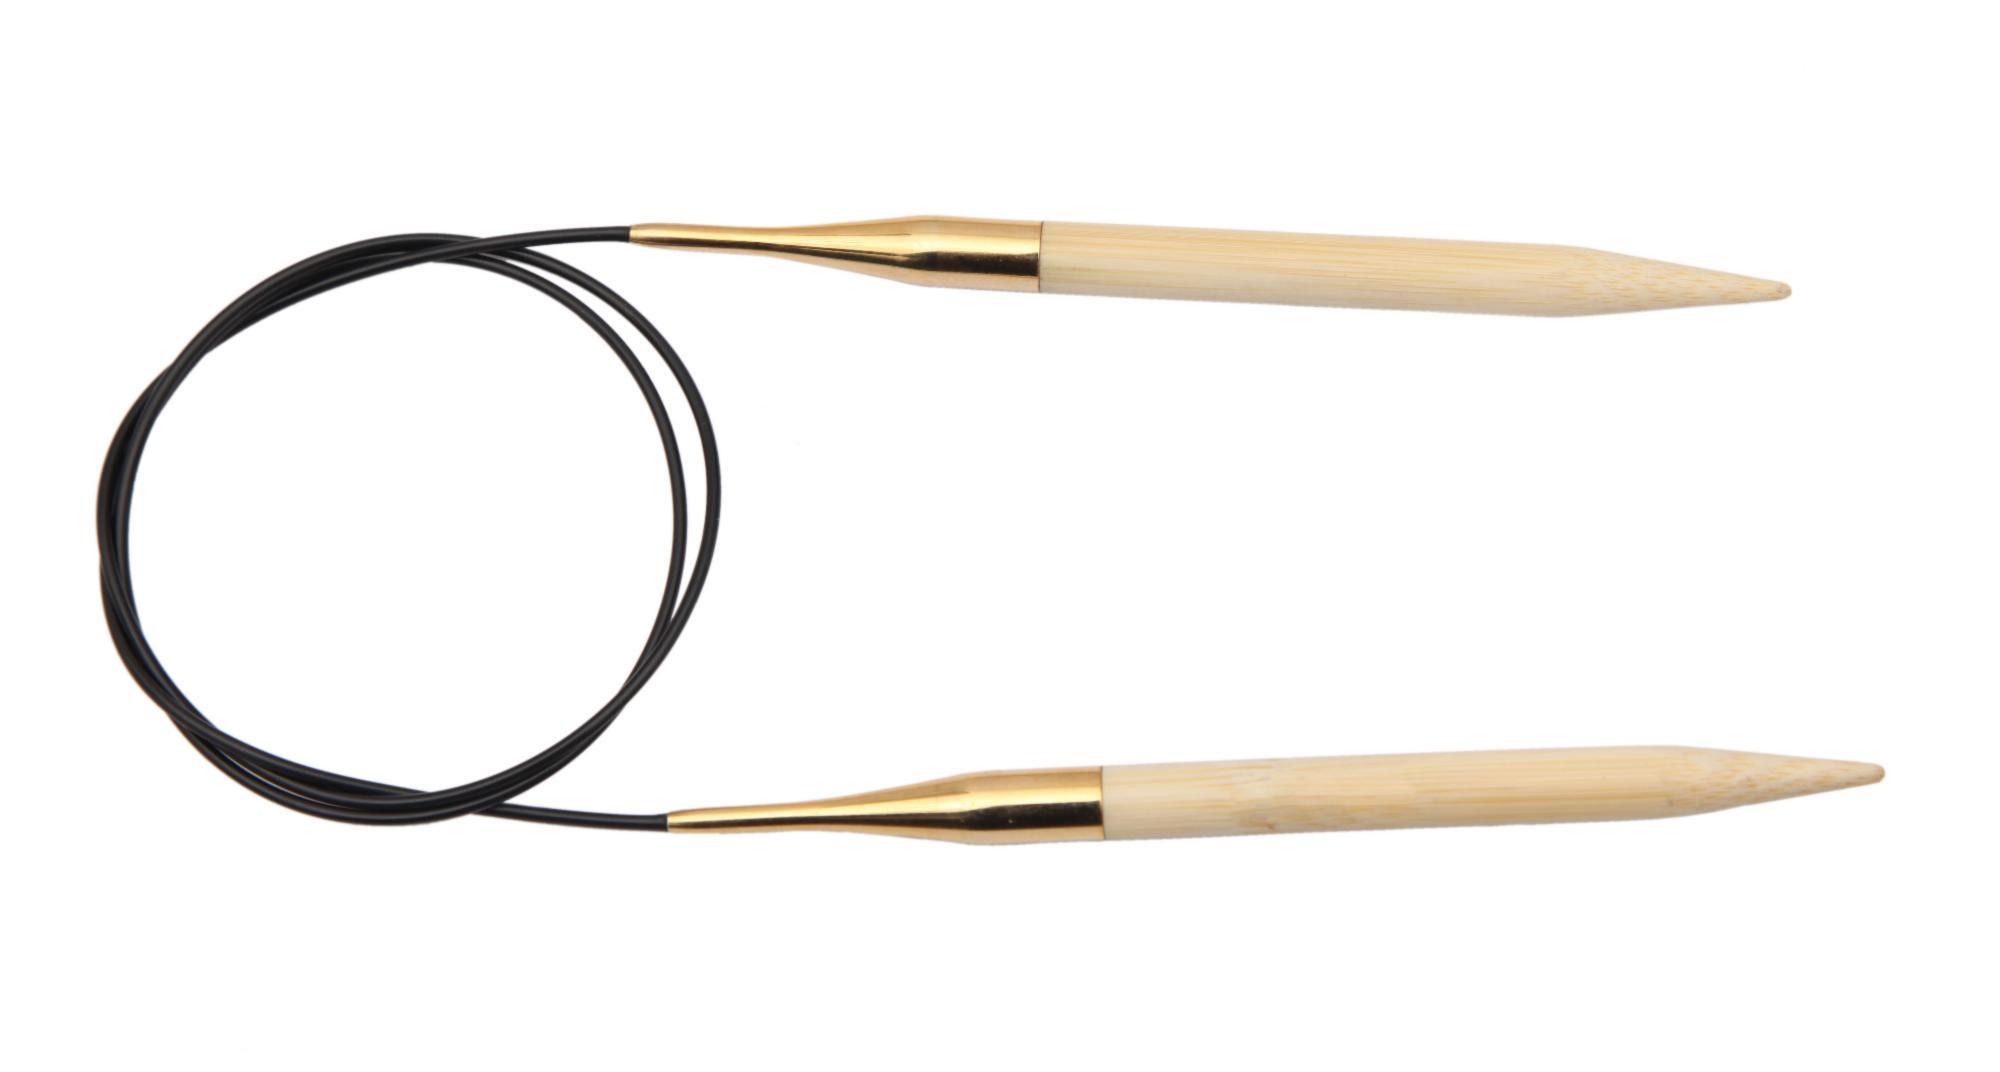 Спицы круговые 60 см Bamboo KnitPro, 22231, 6.00 мм